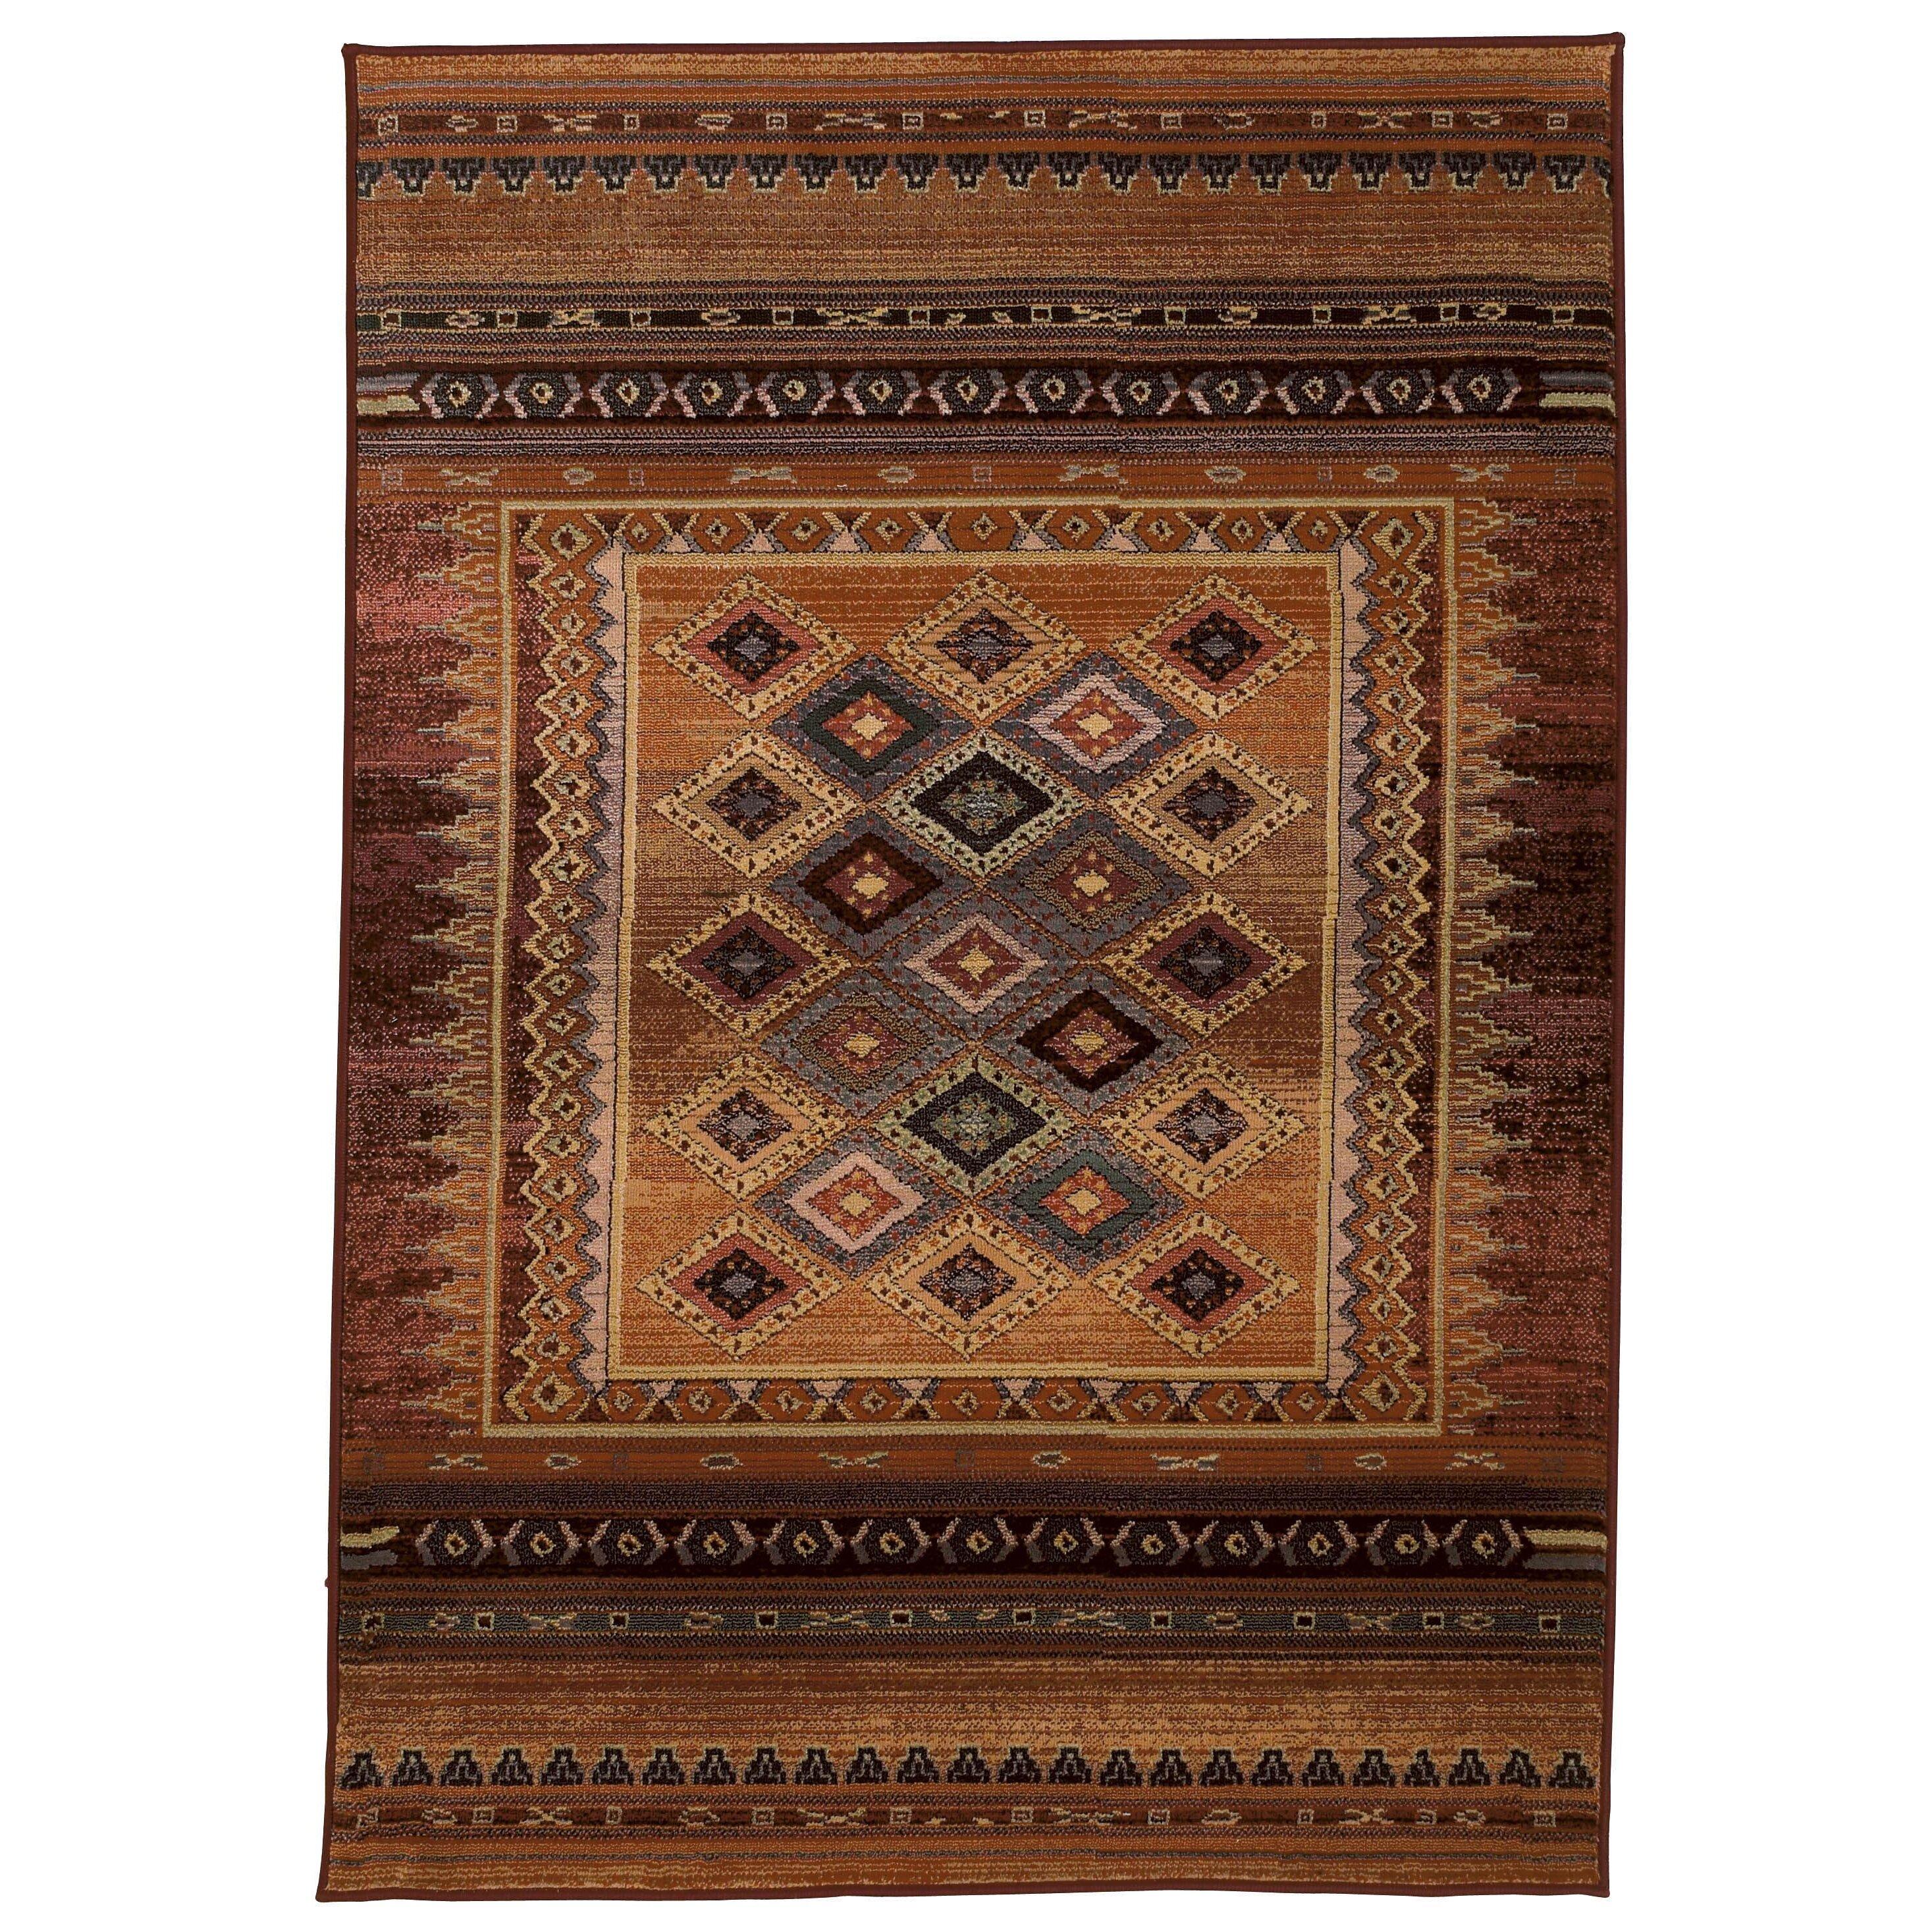 brook lane rugs gabbeh brown indoor outdoor area rug. Black Bedroom Furniture Sets. Home Design Ideas